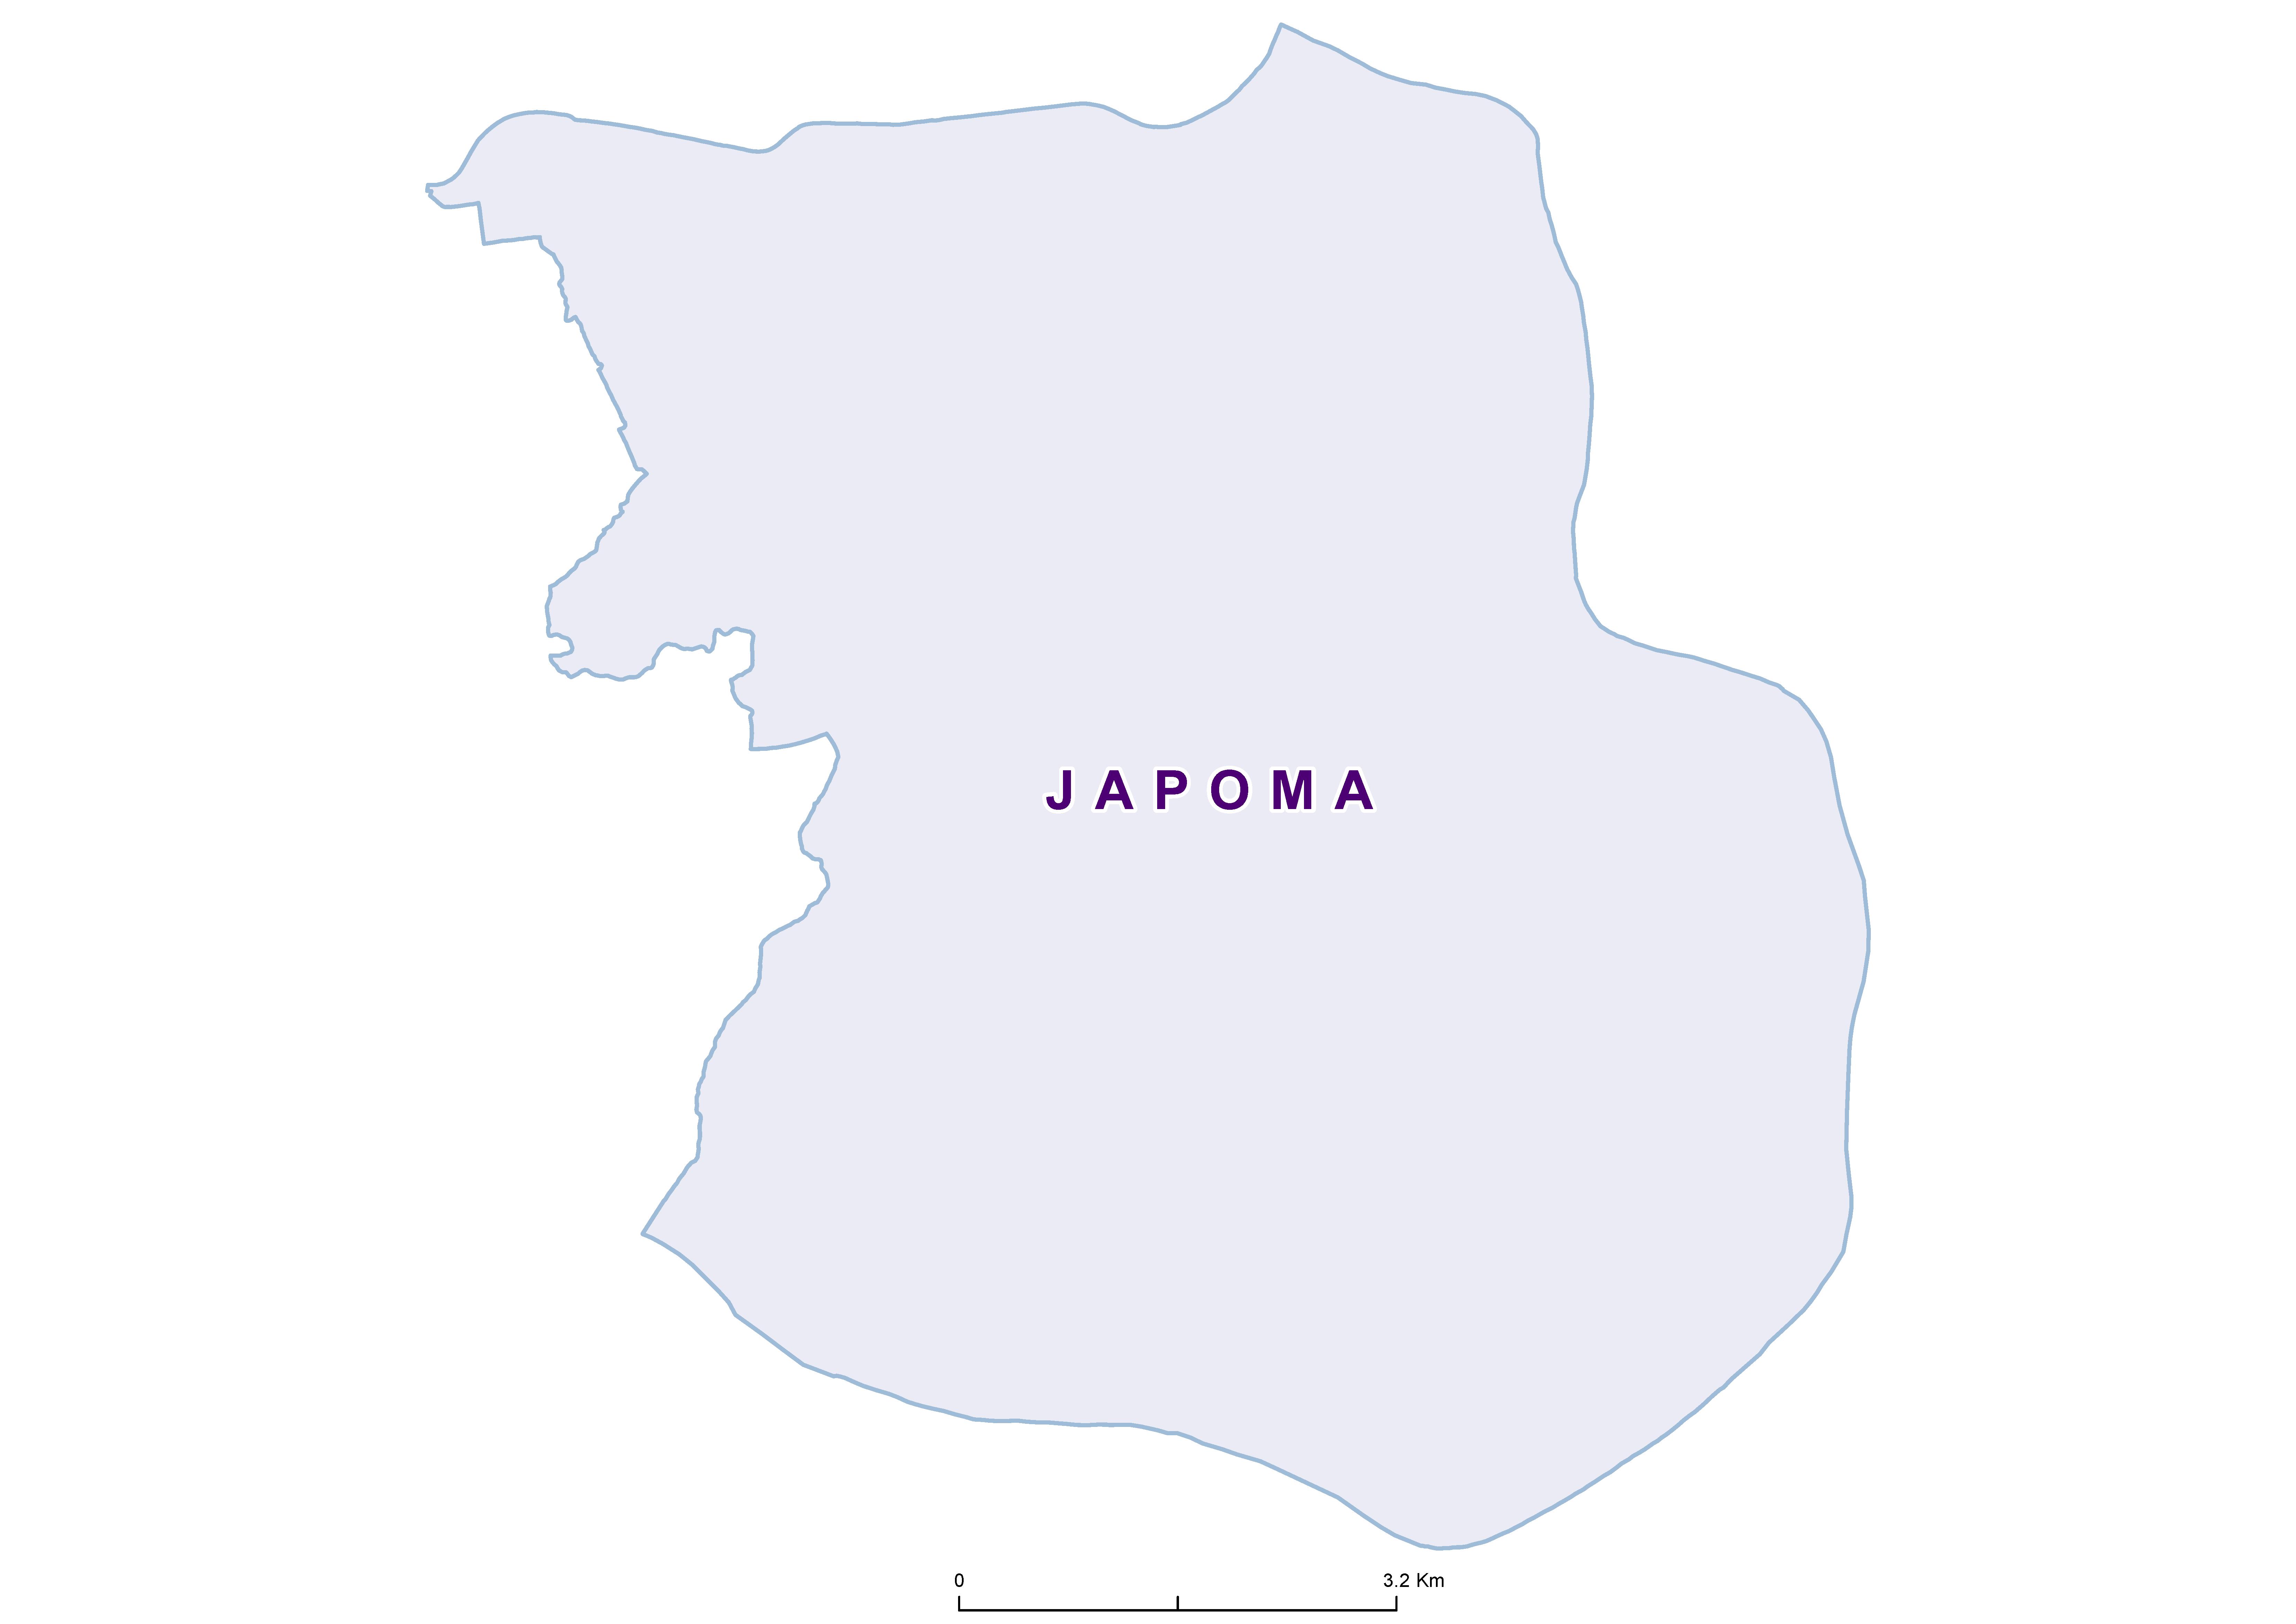 Japoma Max STH 20180001